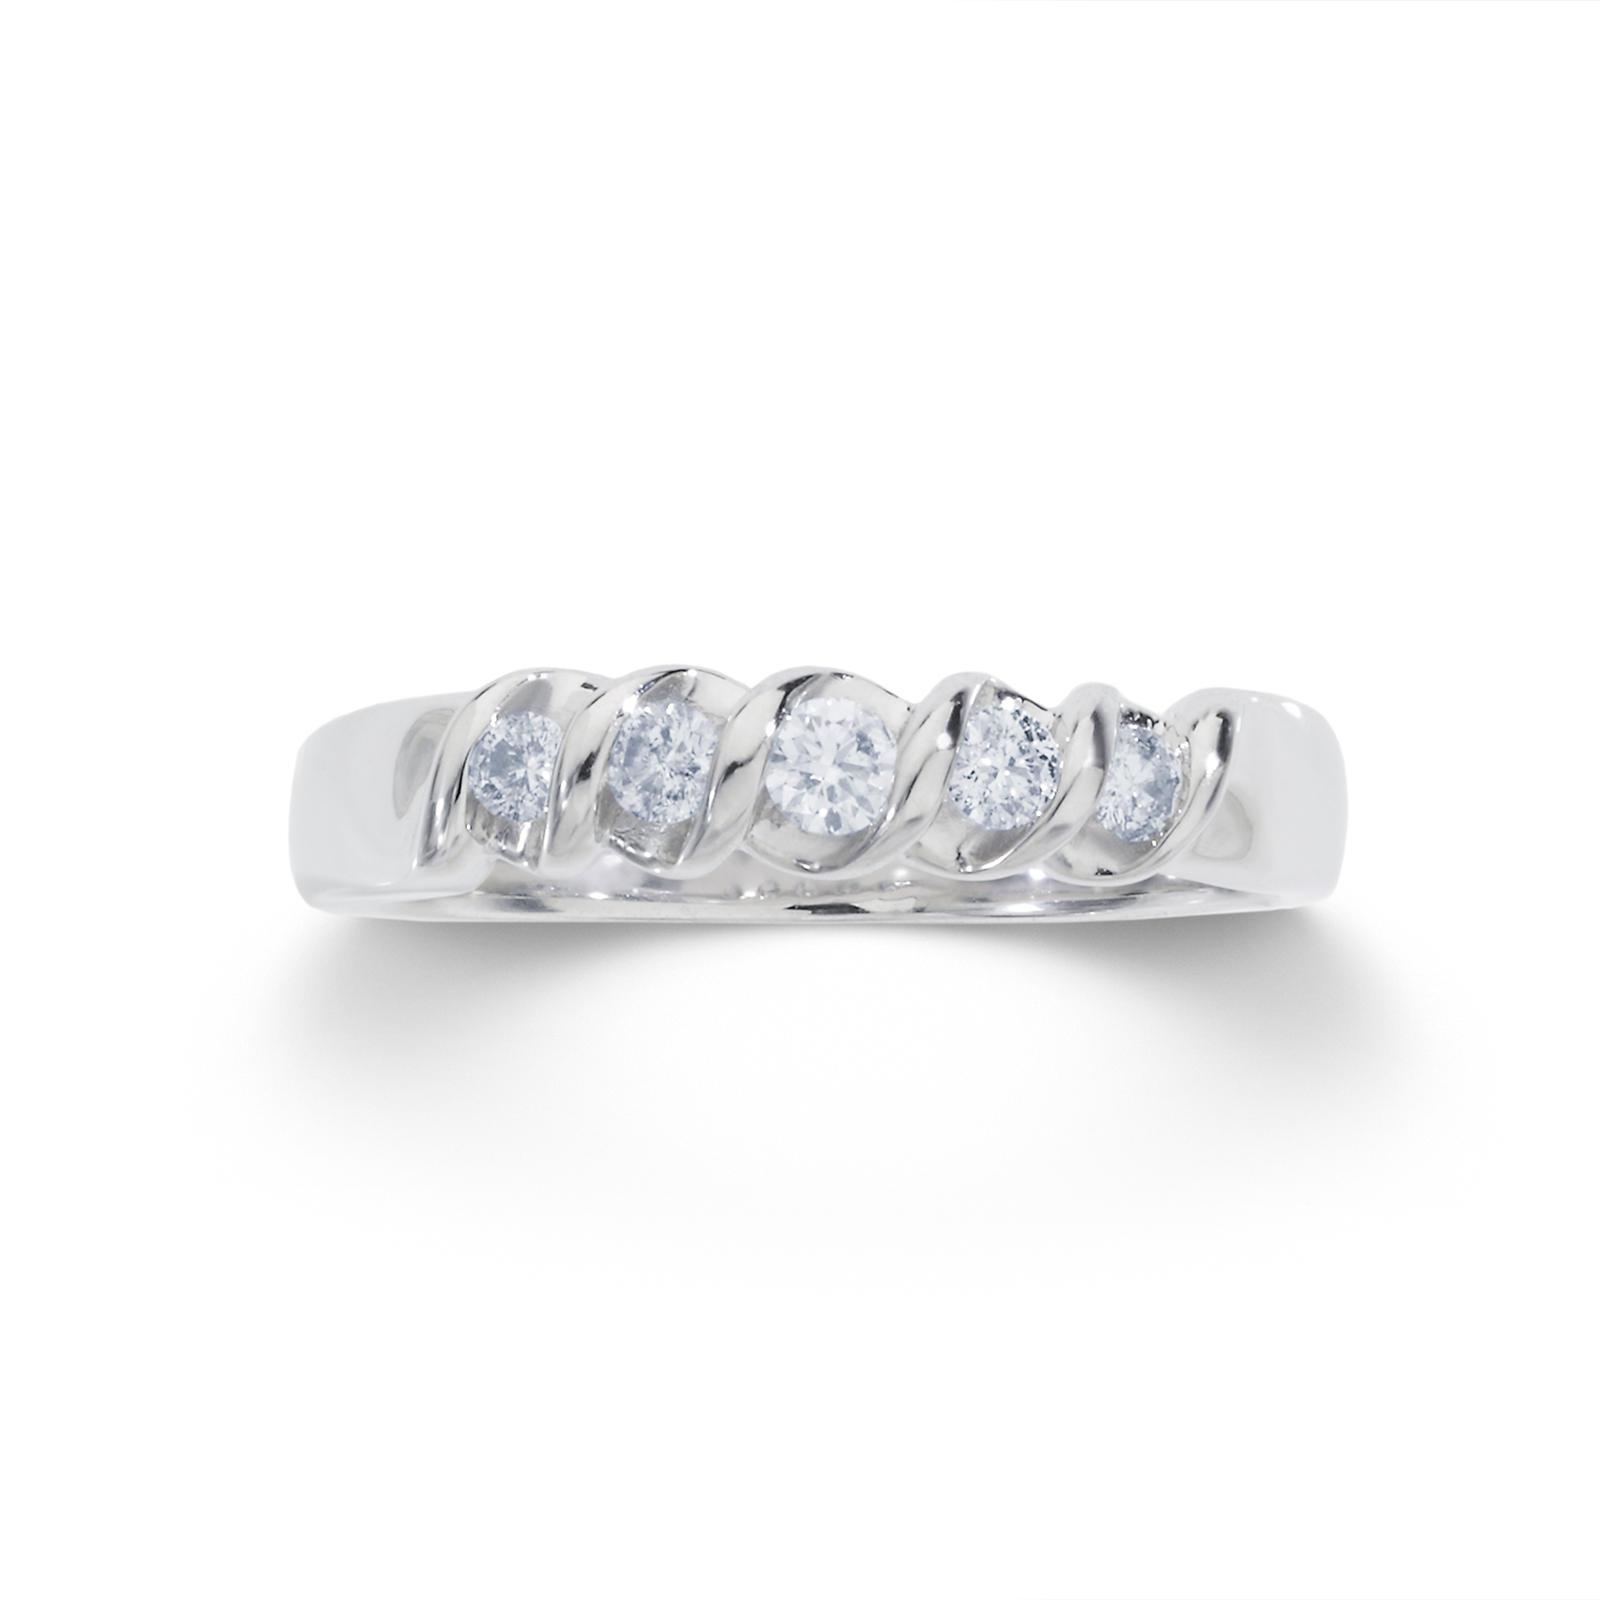 Tradition Diamond 1/4 cttw Round 10k White Gold Diamond Wedding Band - Size 7 Only